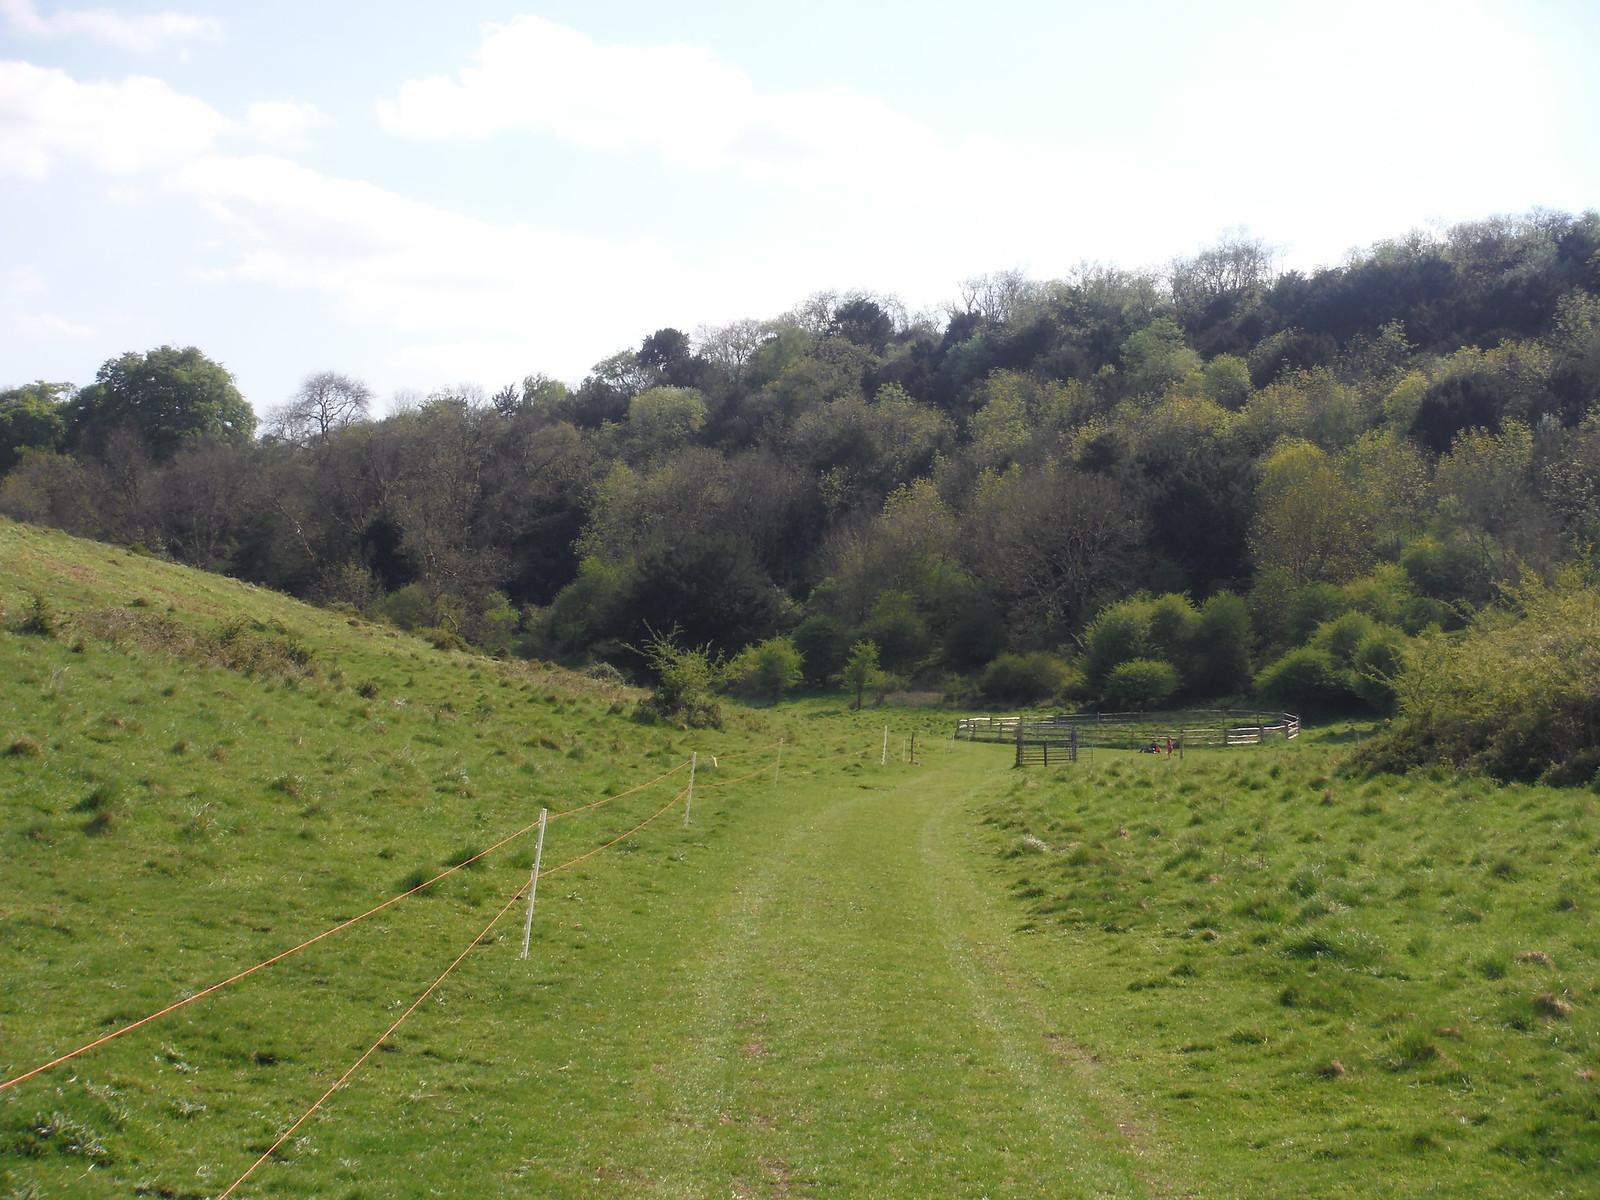 Narrow End of Bramshott Bottom SWC Walk Rowlands Castle Circular - Extension